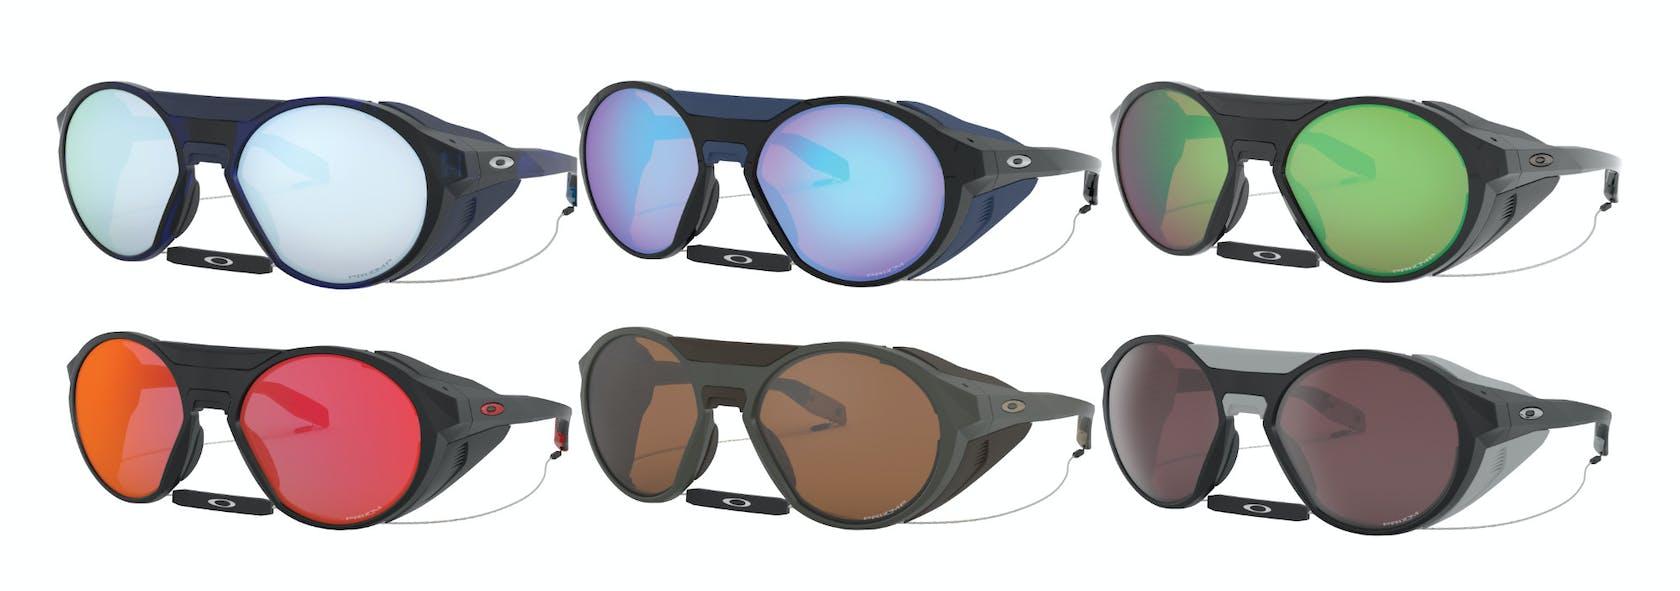 Shop Online occhiali sportivi Oakley Clifden